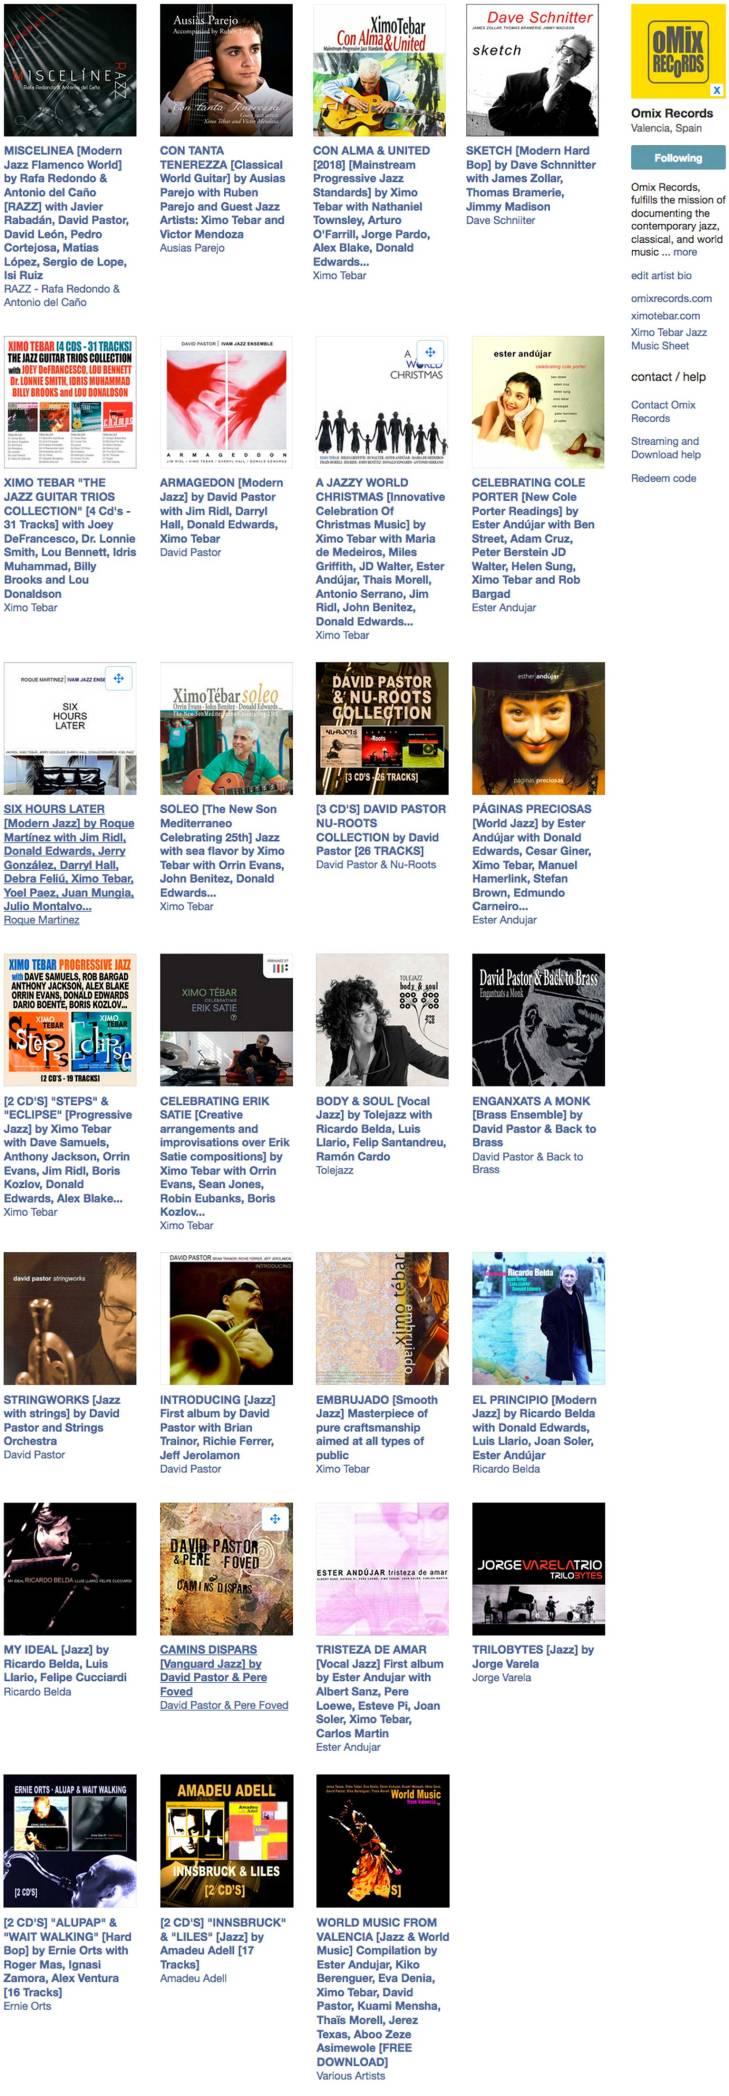 catalogo-omix-records-jazz-and-crossover